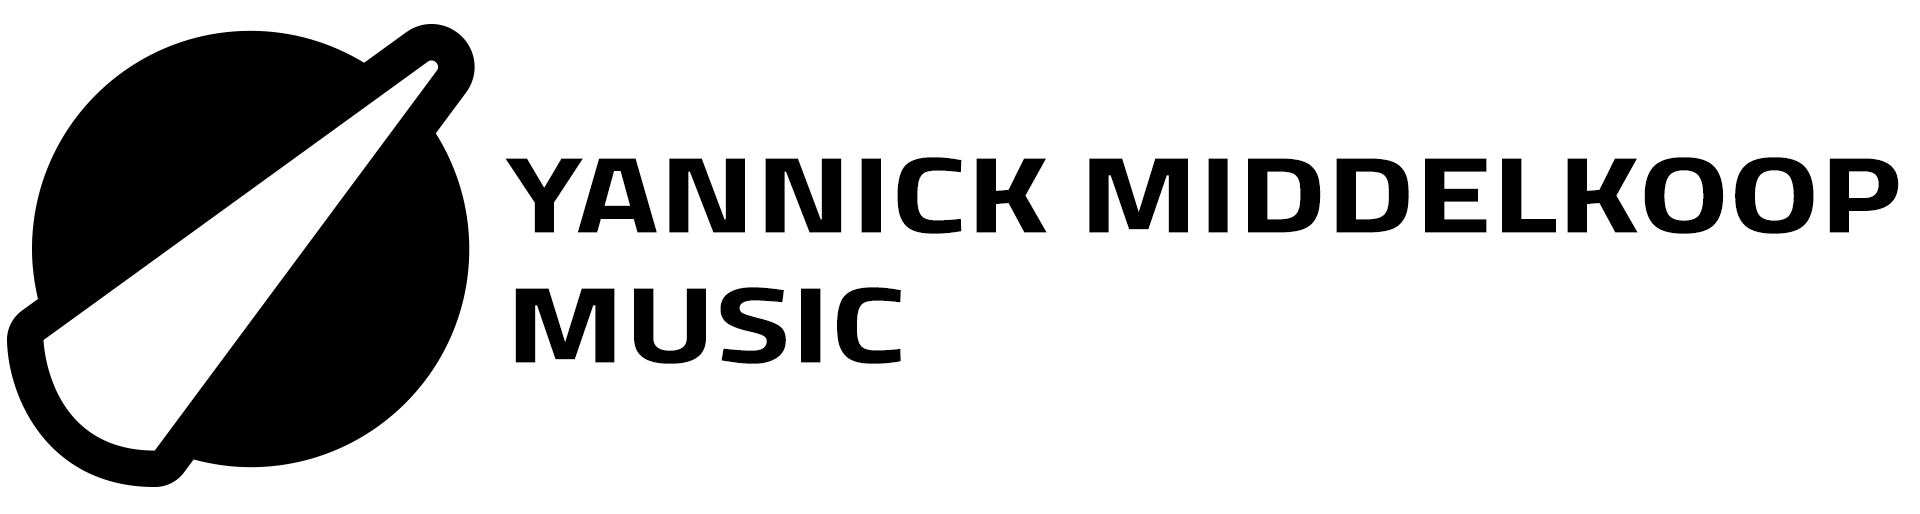 Yannick Middelkoop Music